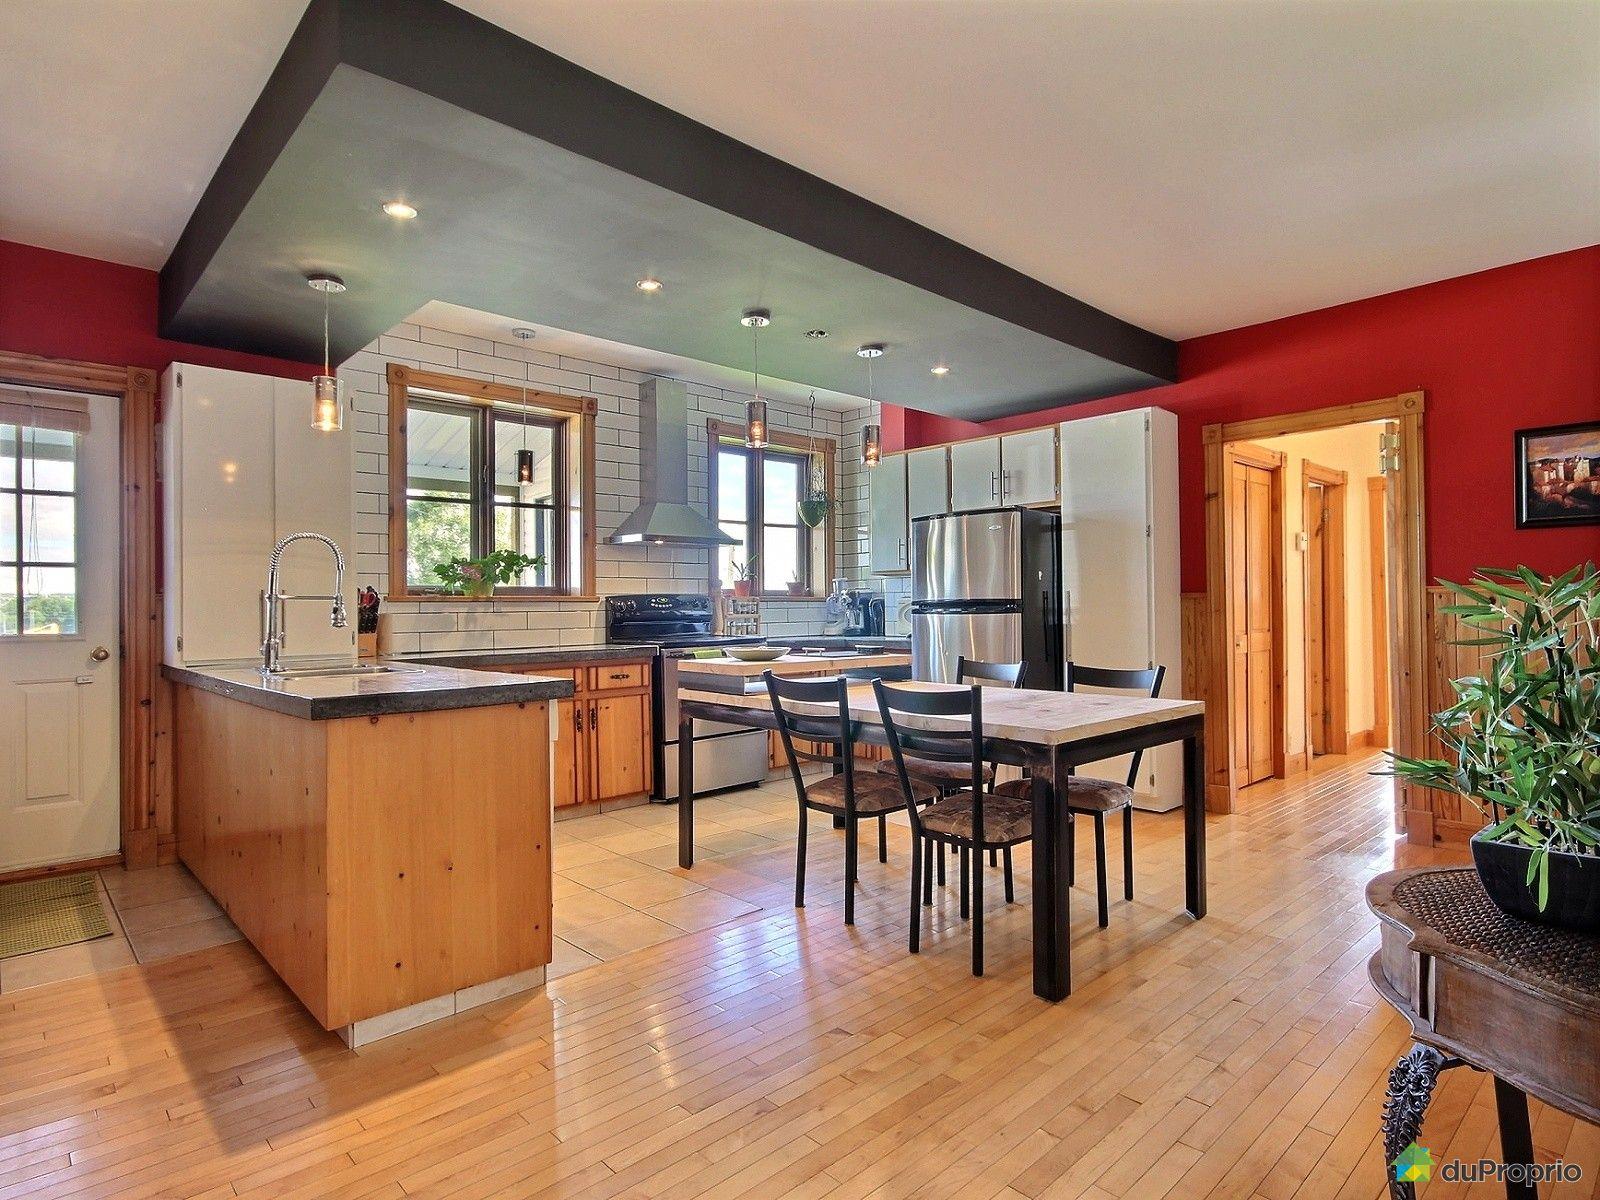 bi g n ration vendre ch teau richer 8754 avenue royale immobilier qu bec duproprio 632564. Black Bedroom Furniture Sets. Home Design Ideas